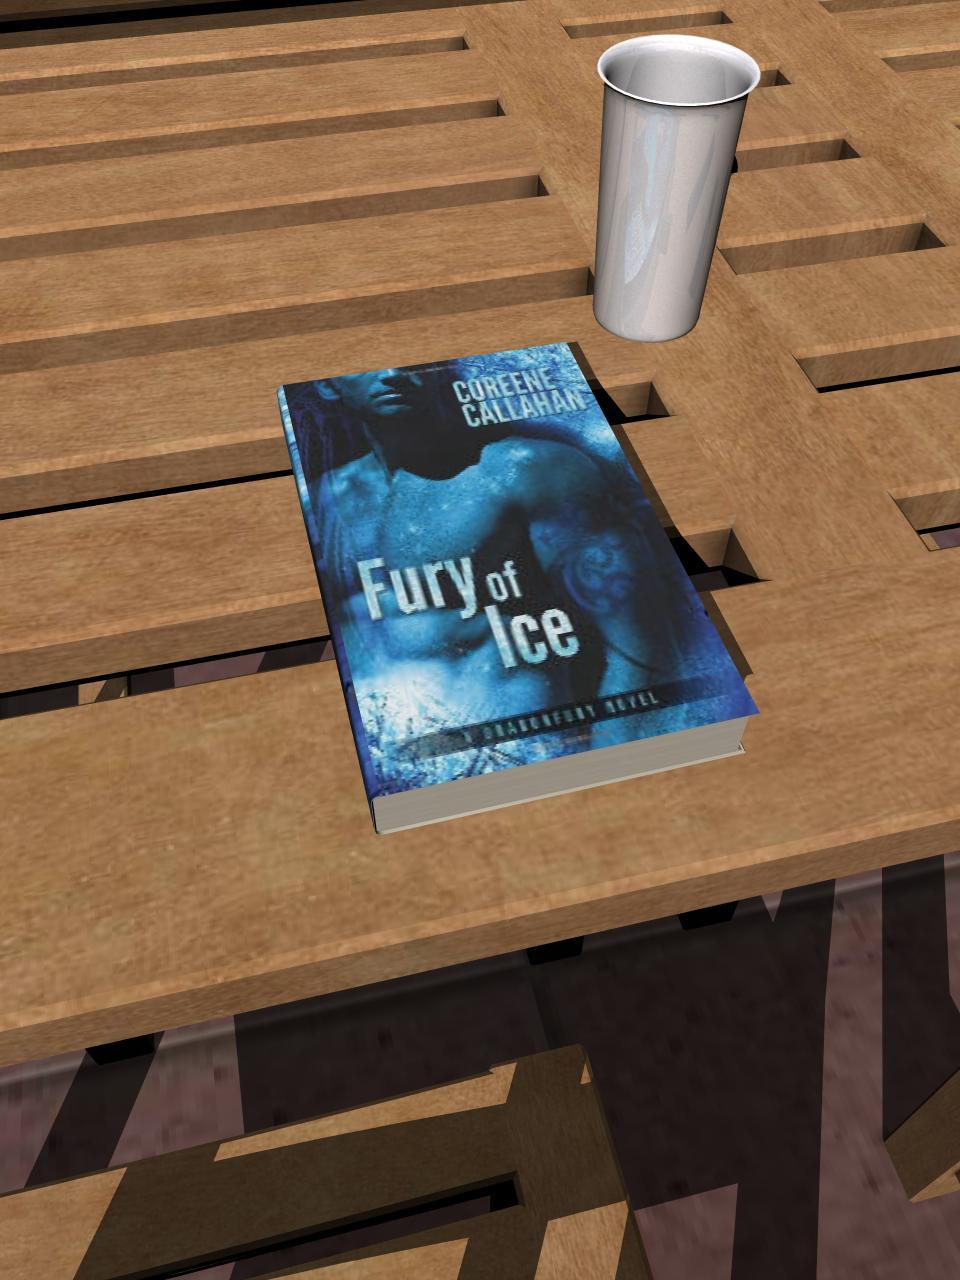 Fury of Ice (Dragonfury Book2)